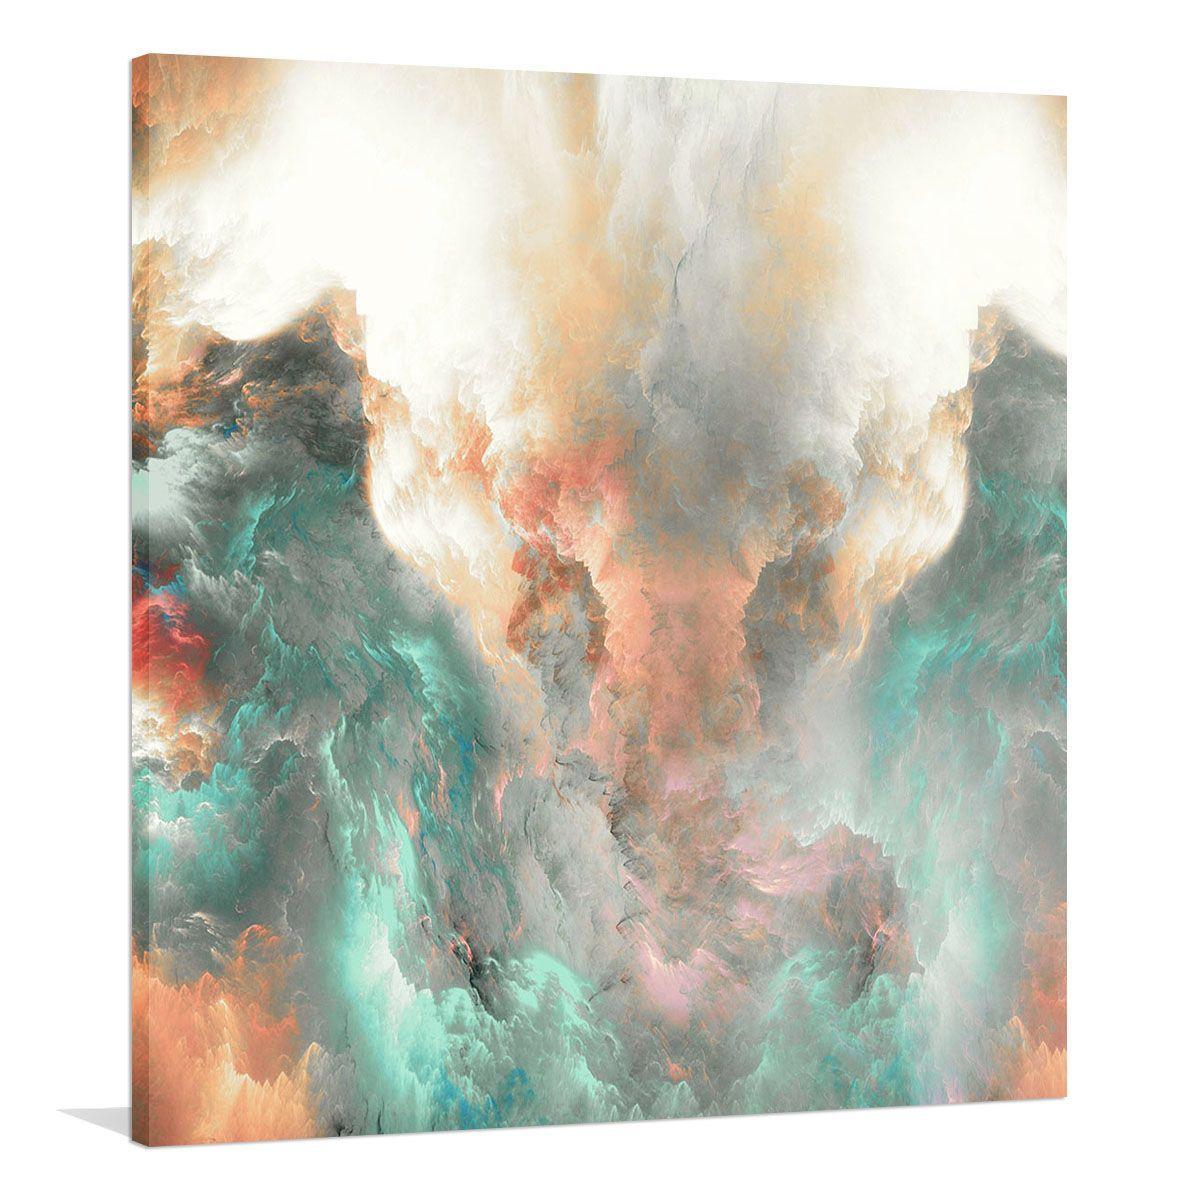 Peerless horizons 4 canvas print buy australian made for Buy canvas prints online